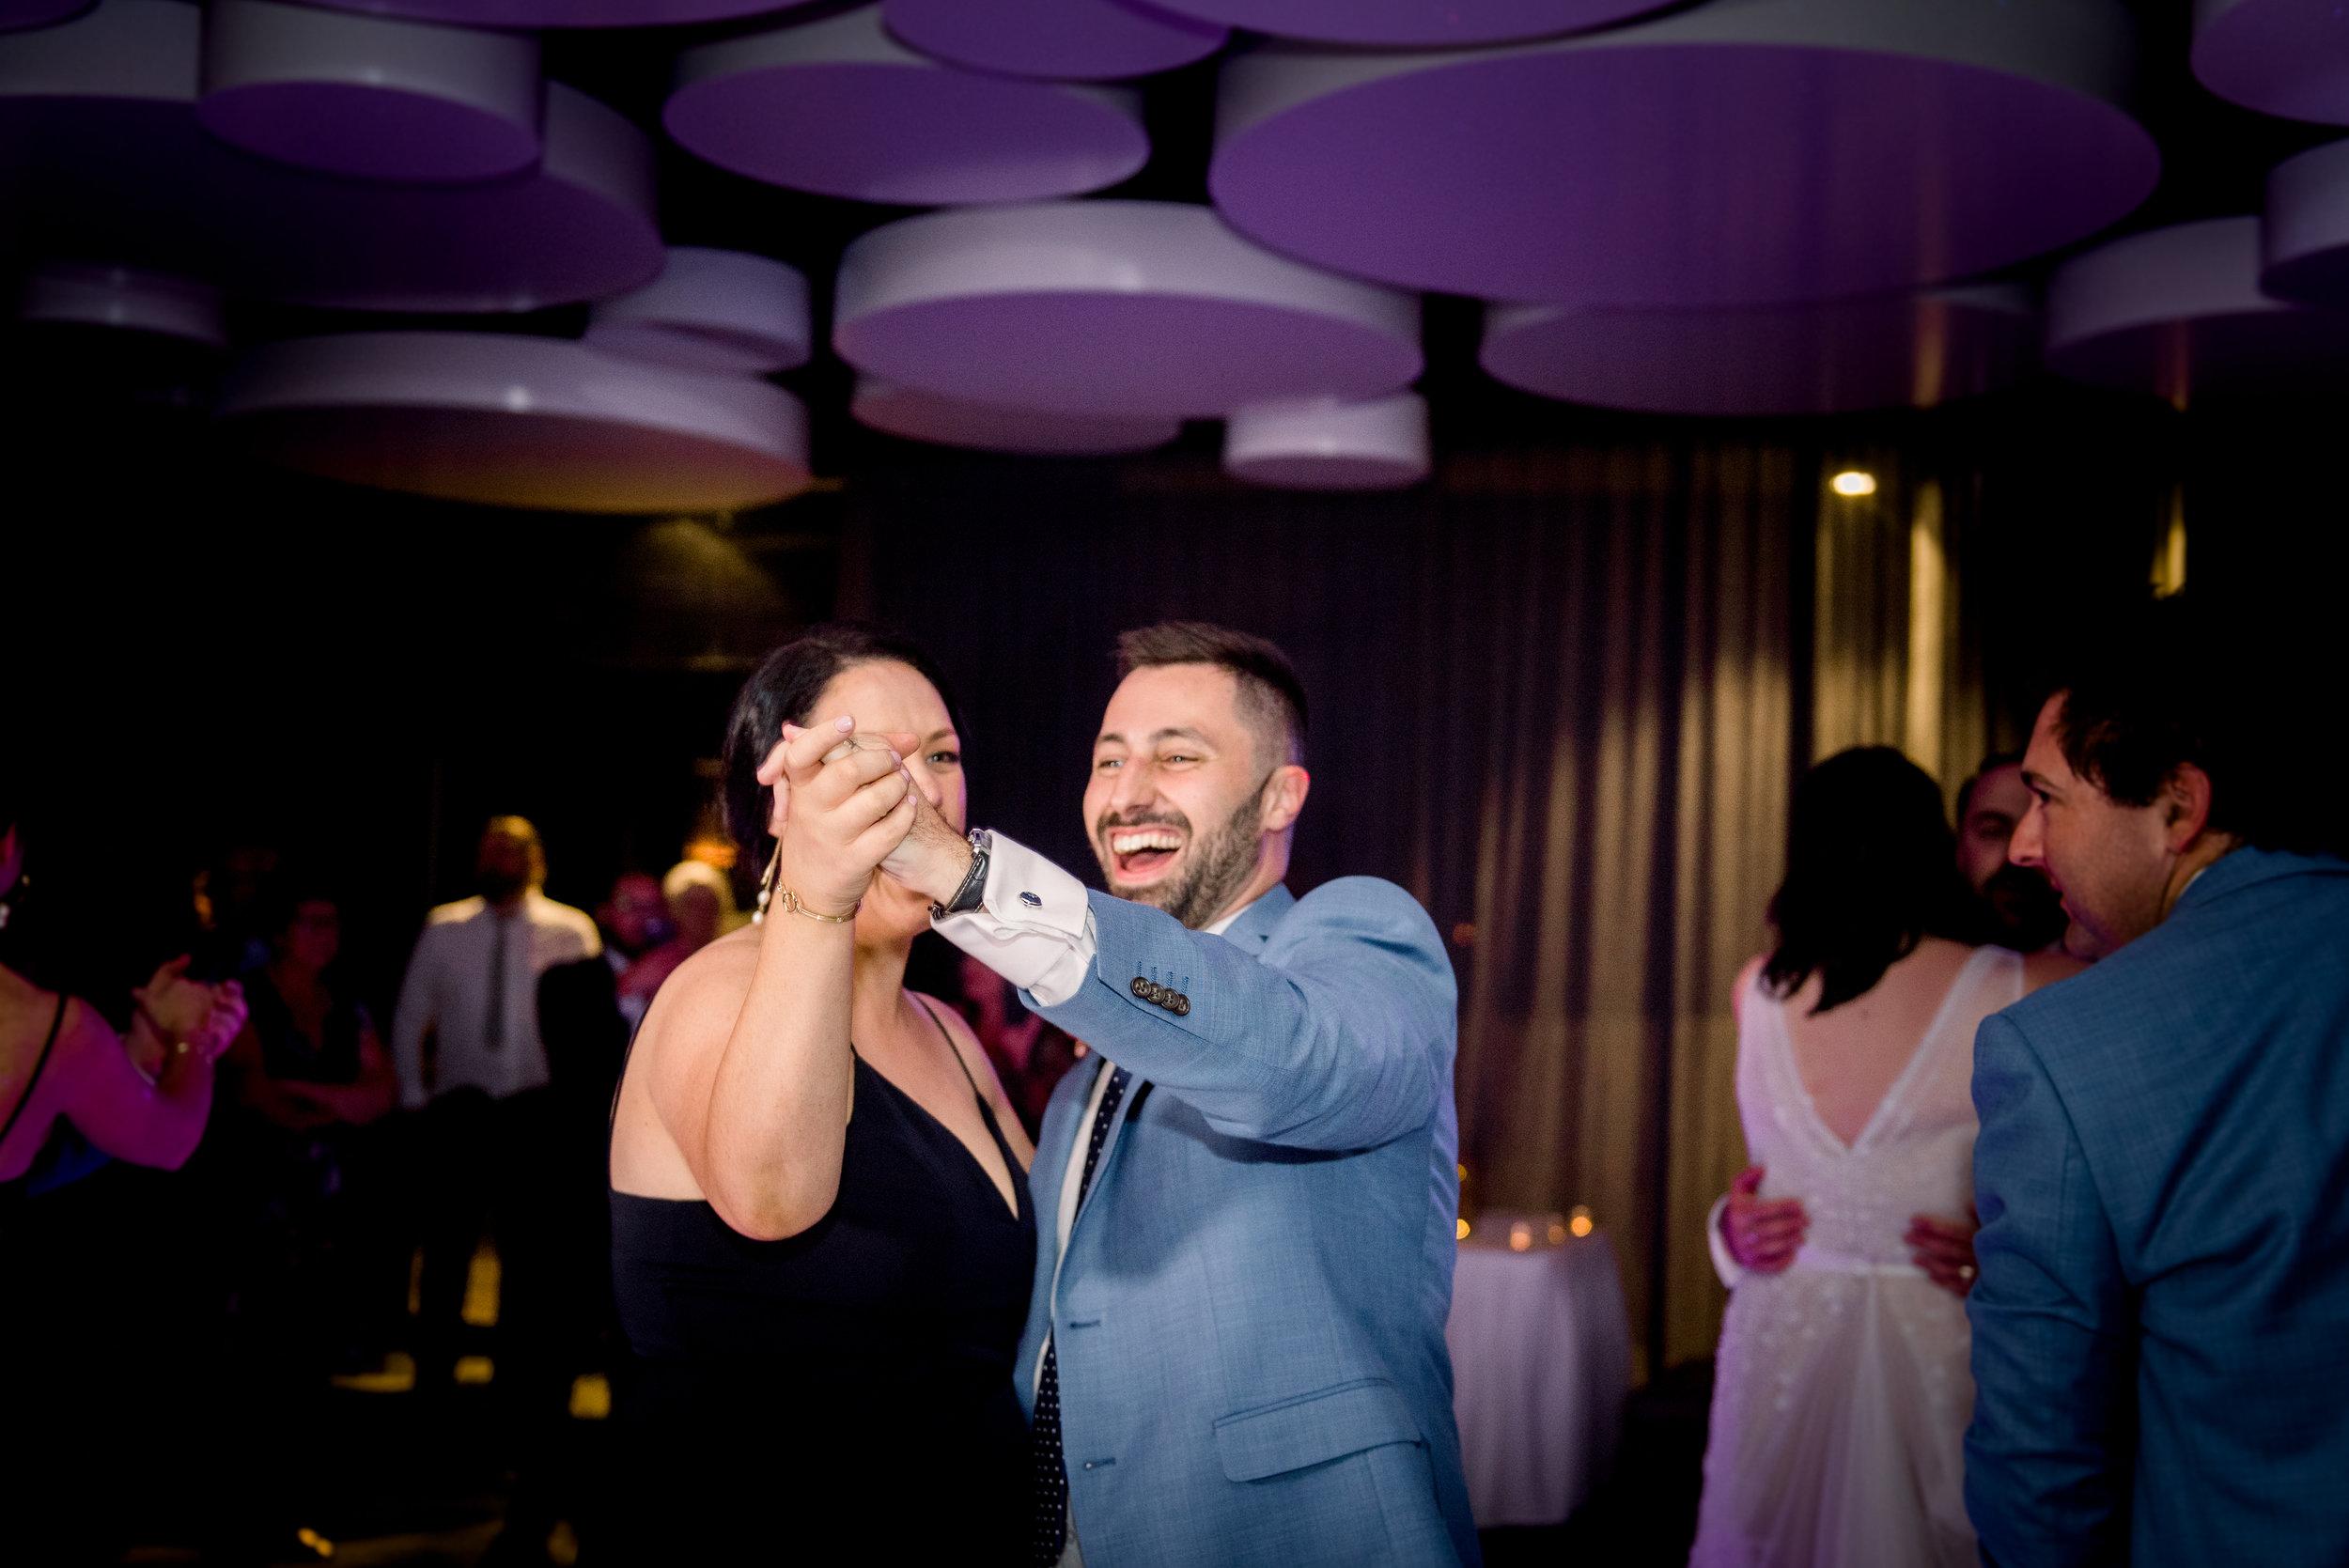 brisbane-city-wedding-photographer-romantic-wedding-117.jpg